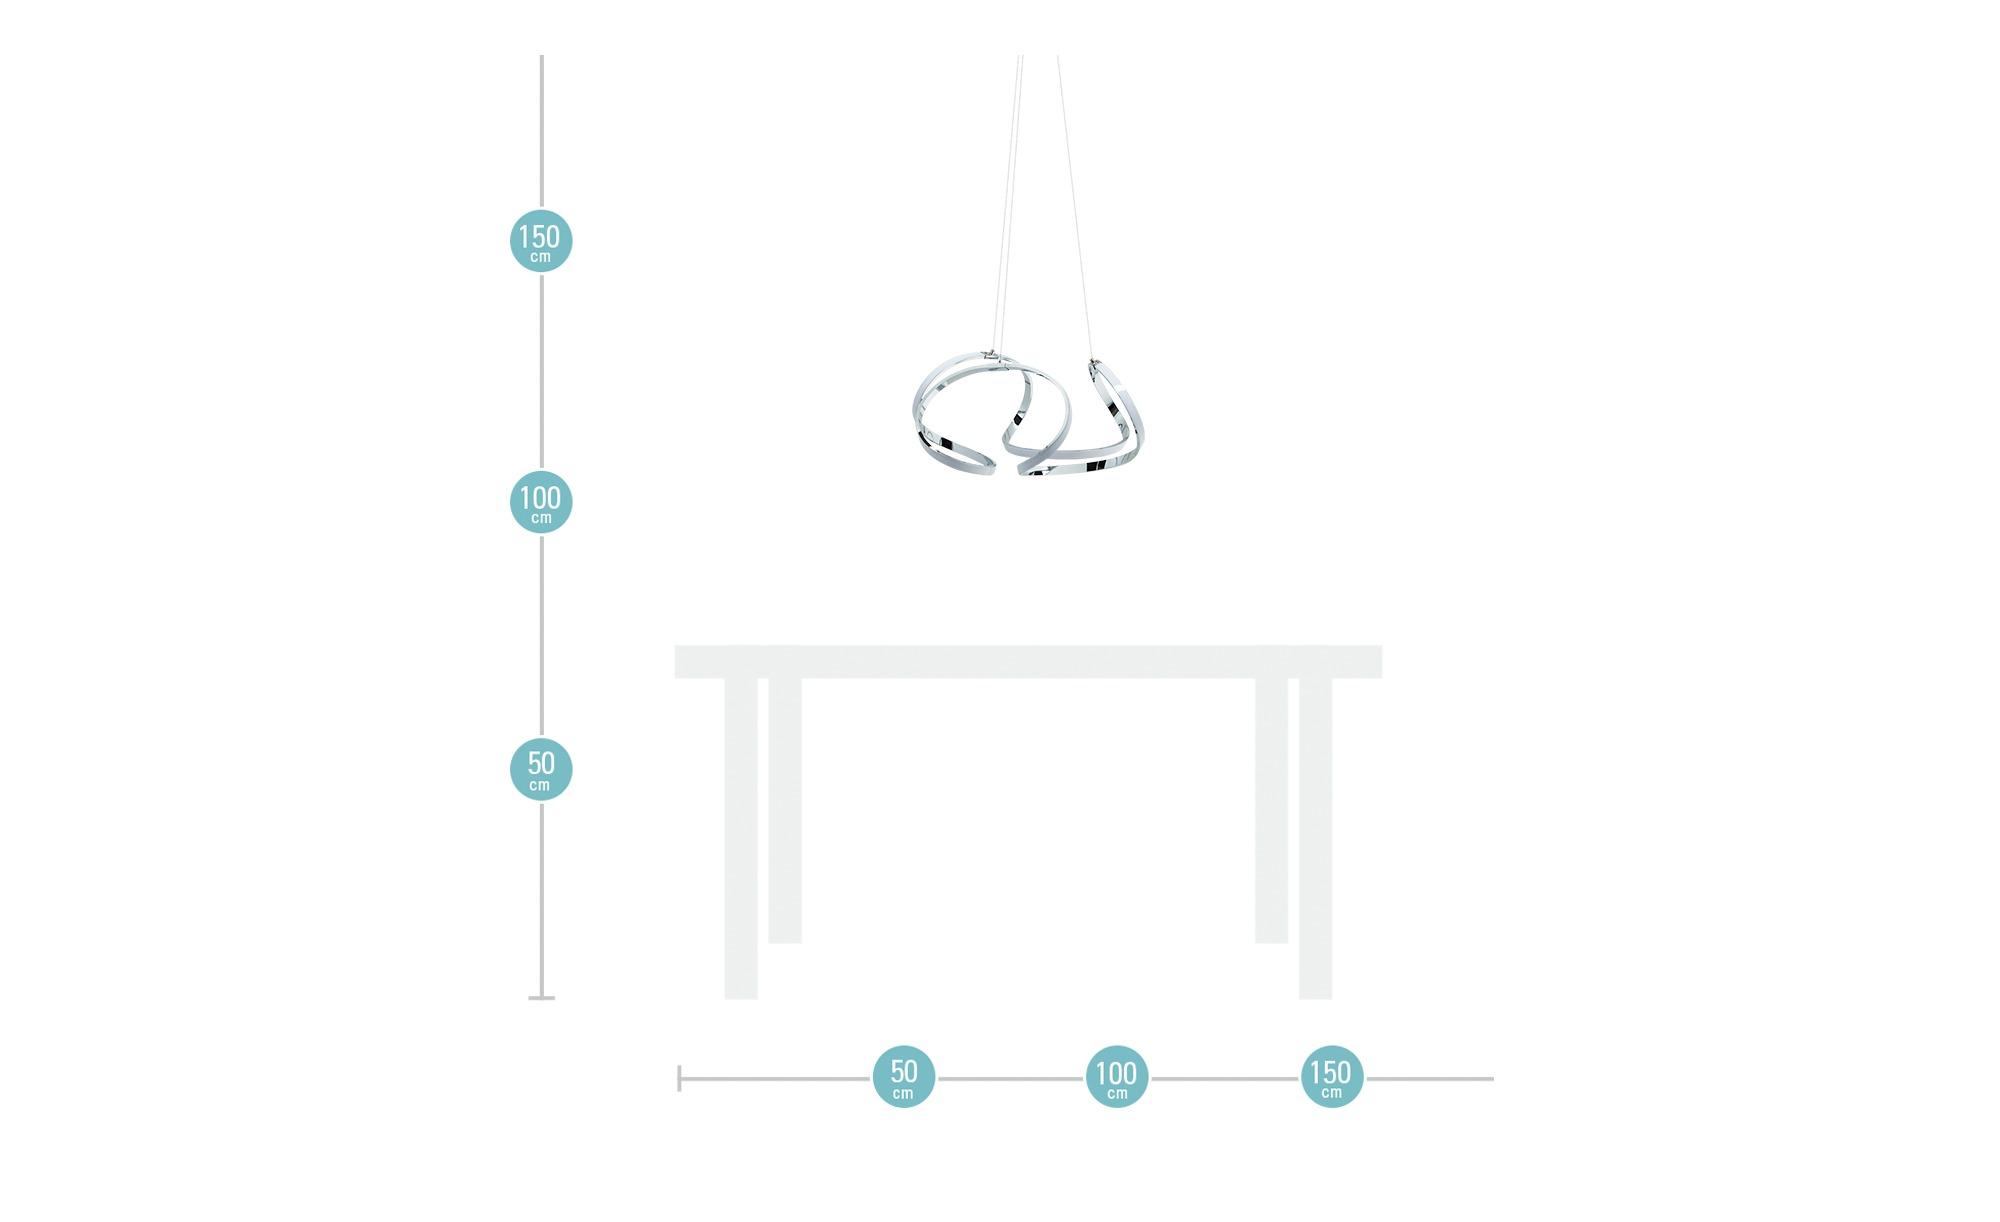 KHG LED-Pendelleuchte, geschwungen ¦ silber ¦ Maße (cm): H: 150 Ø: 52 Lampen & Leuchten > LED-Leuchten > LED-Pendelleuchten - Höffner